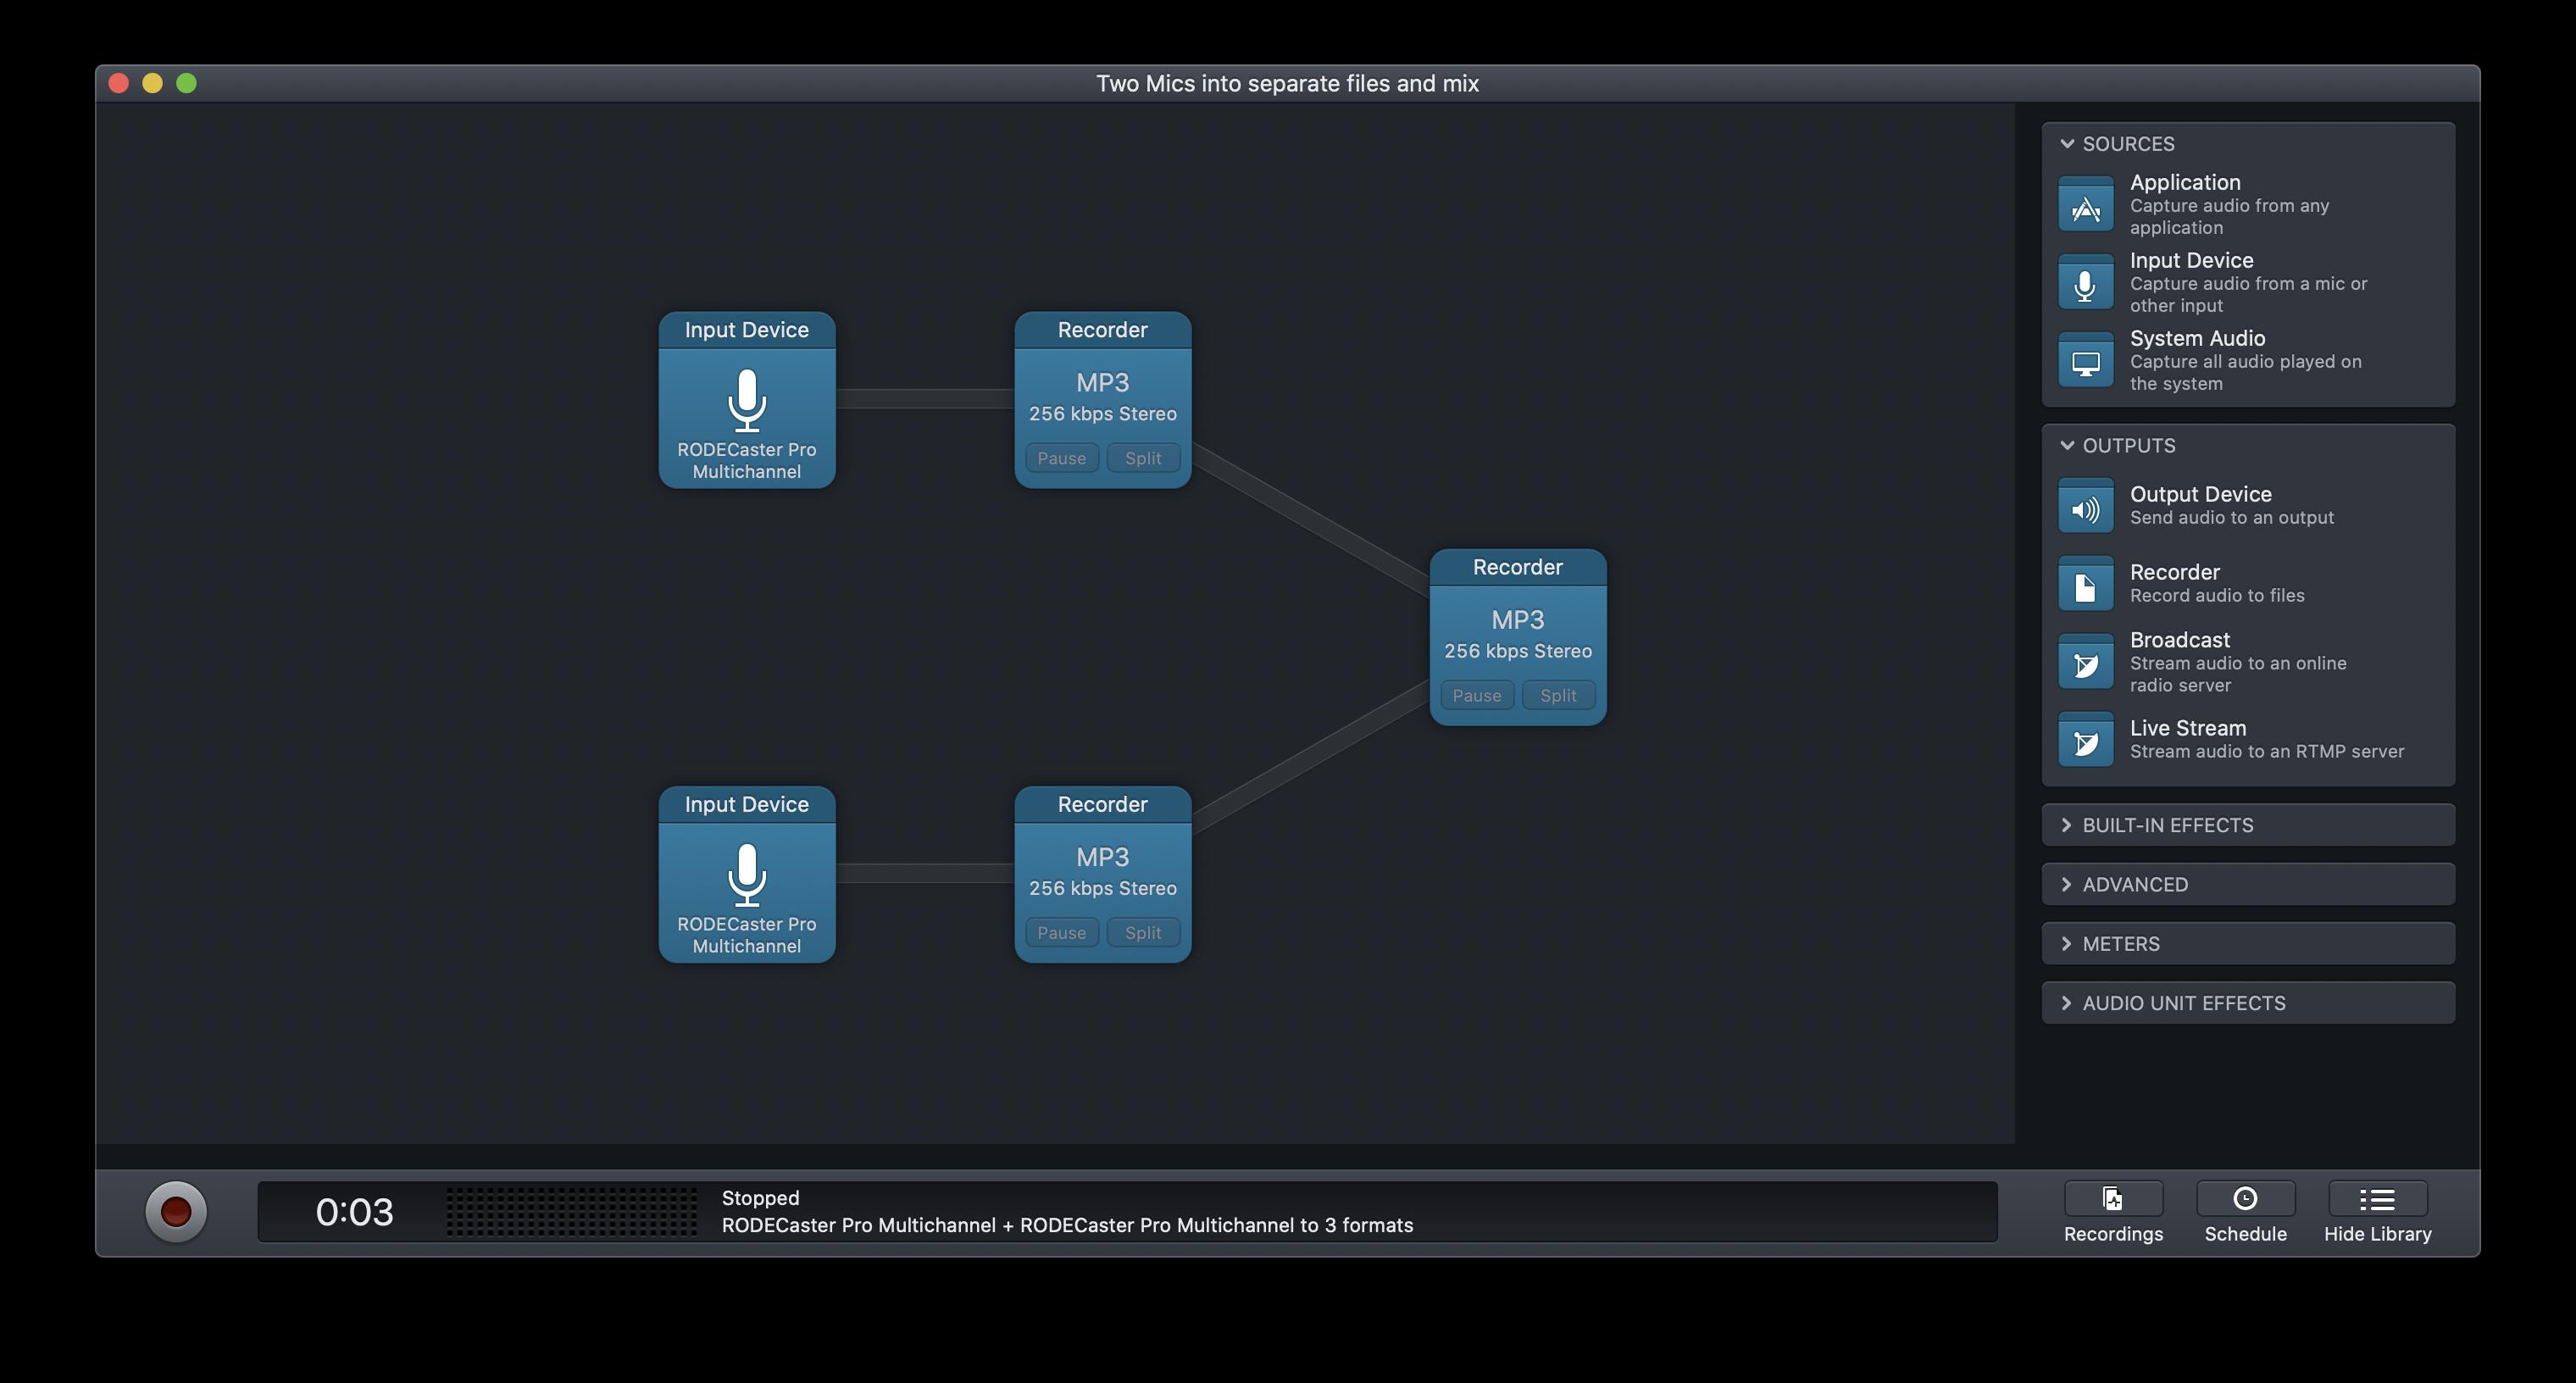 A project flow